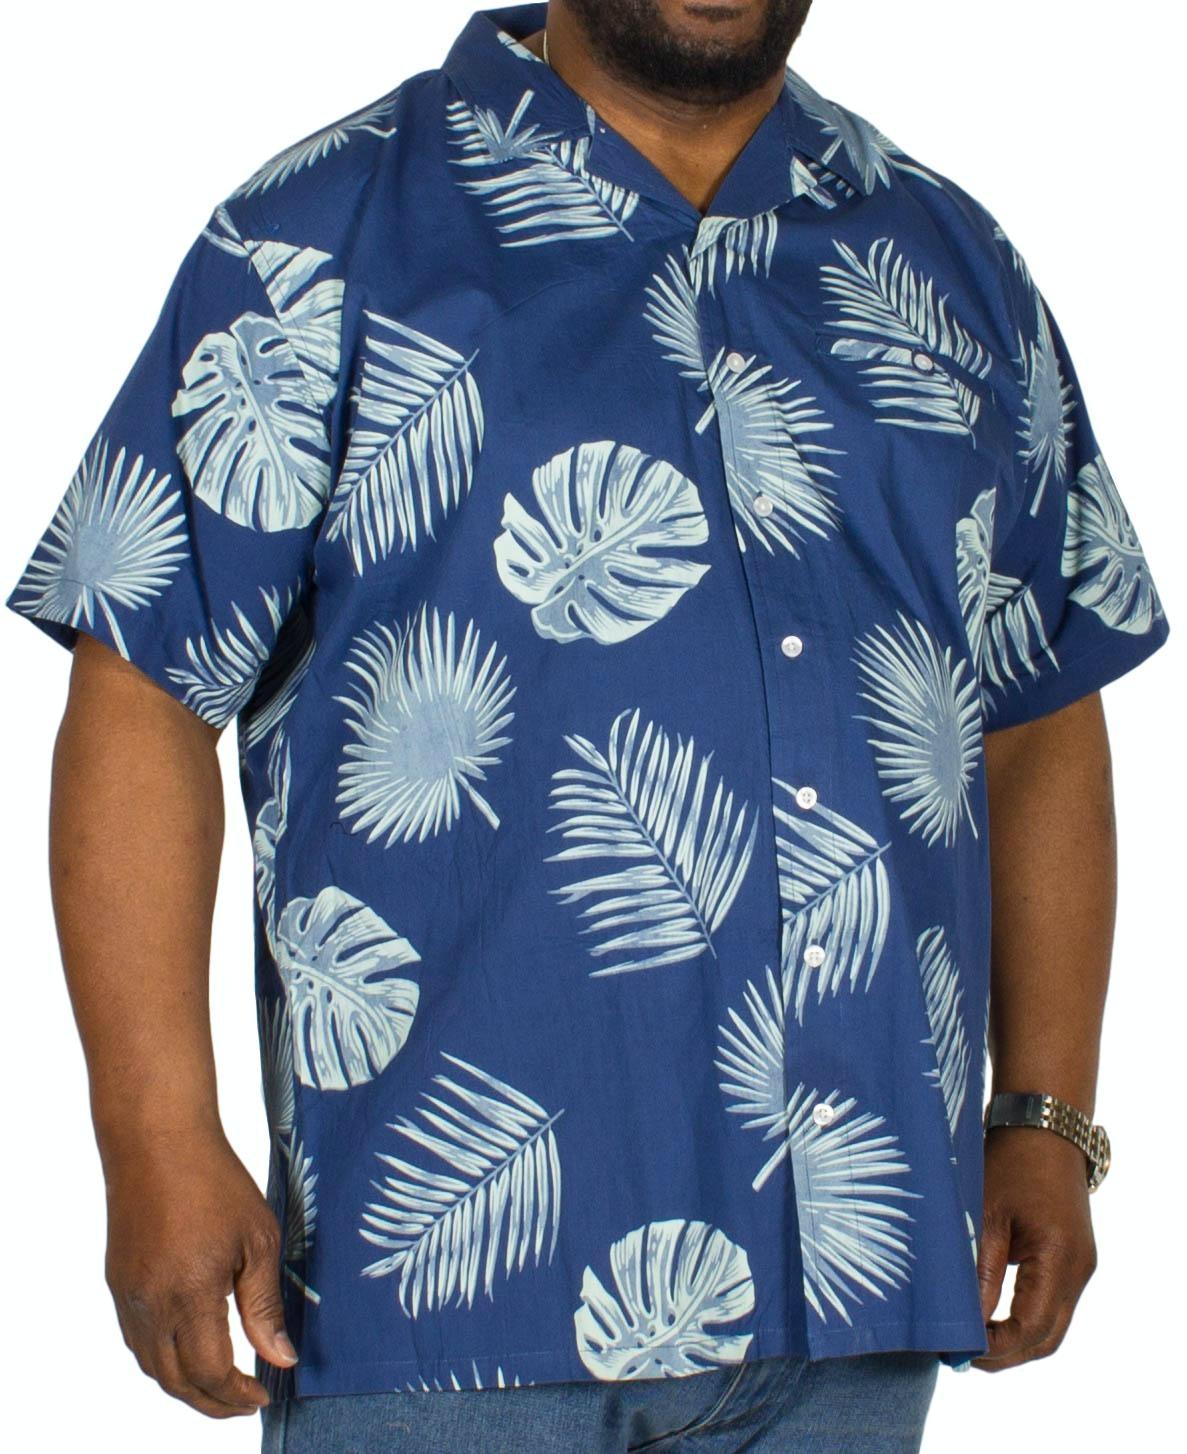 Espionage Leaf Print Short Sleeve Shirt Blue